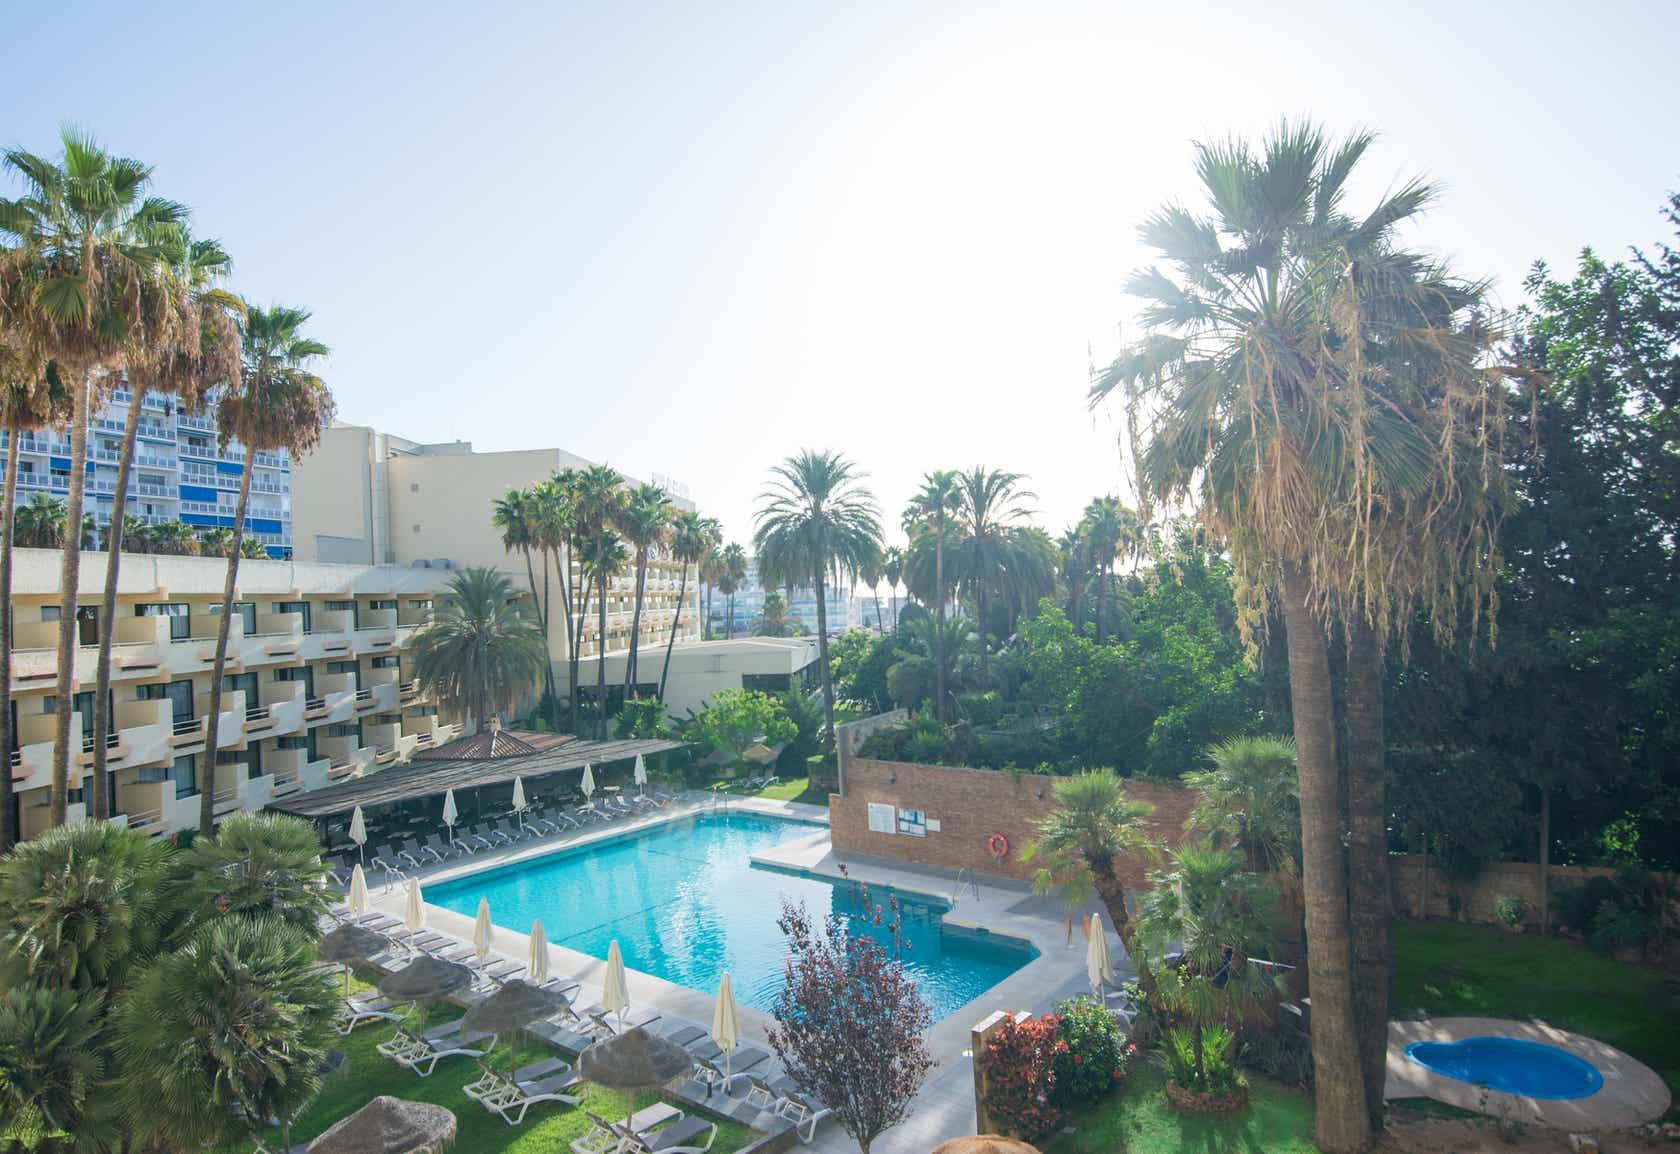 Royal Al Andalus Hotel